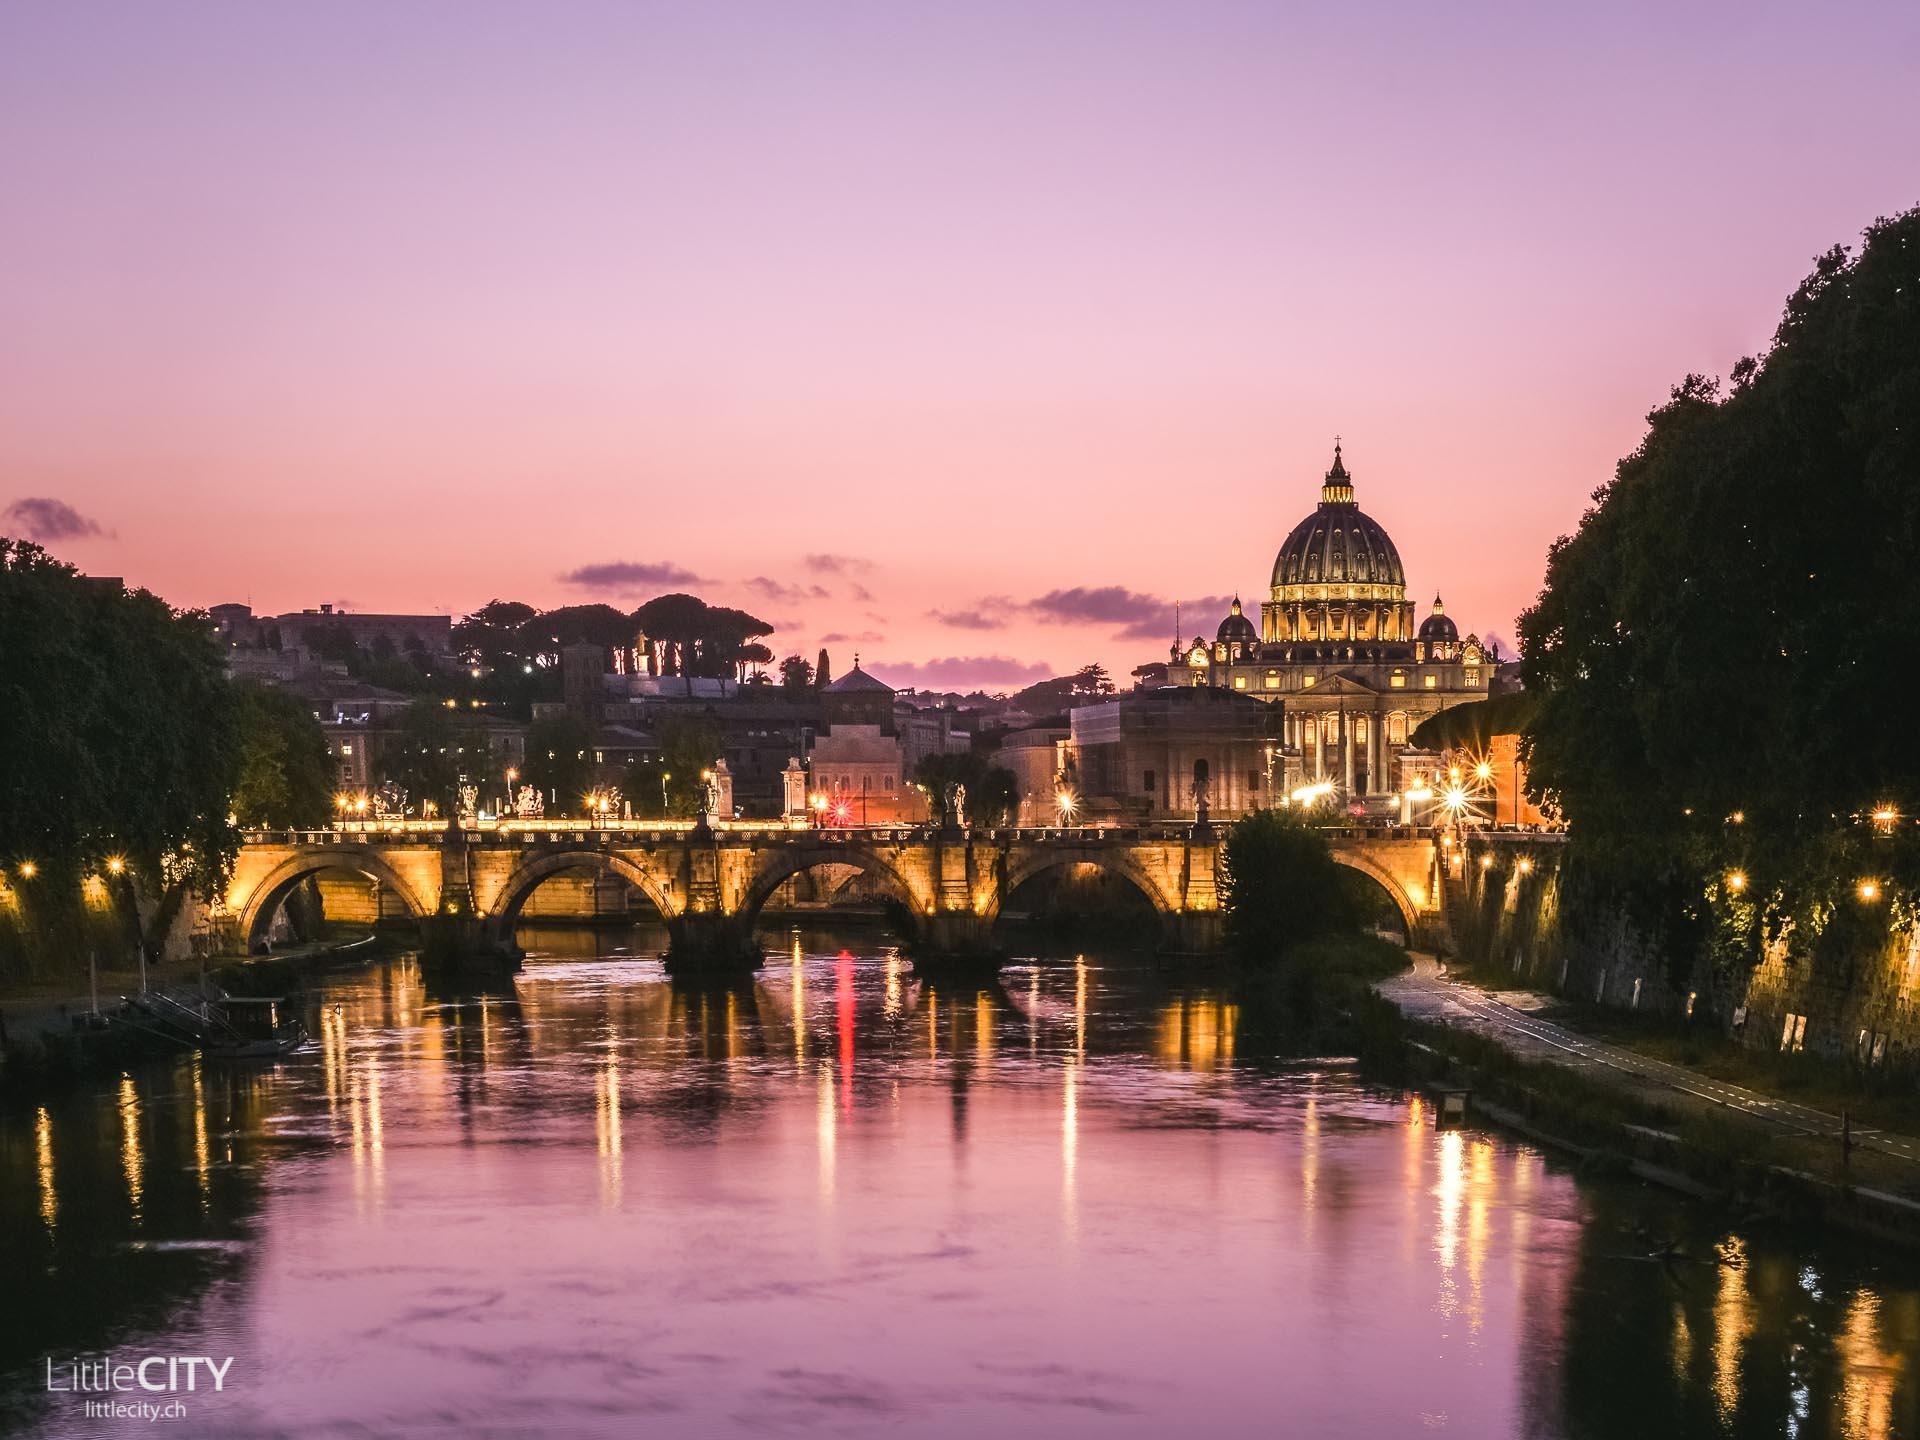 Petersdom am Tiber bei Sonnenuntergang in Rom - Reisetipps